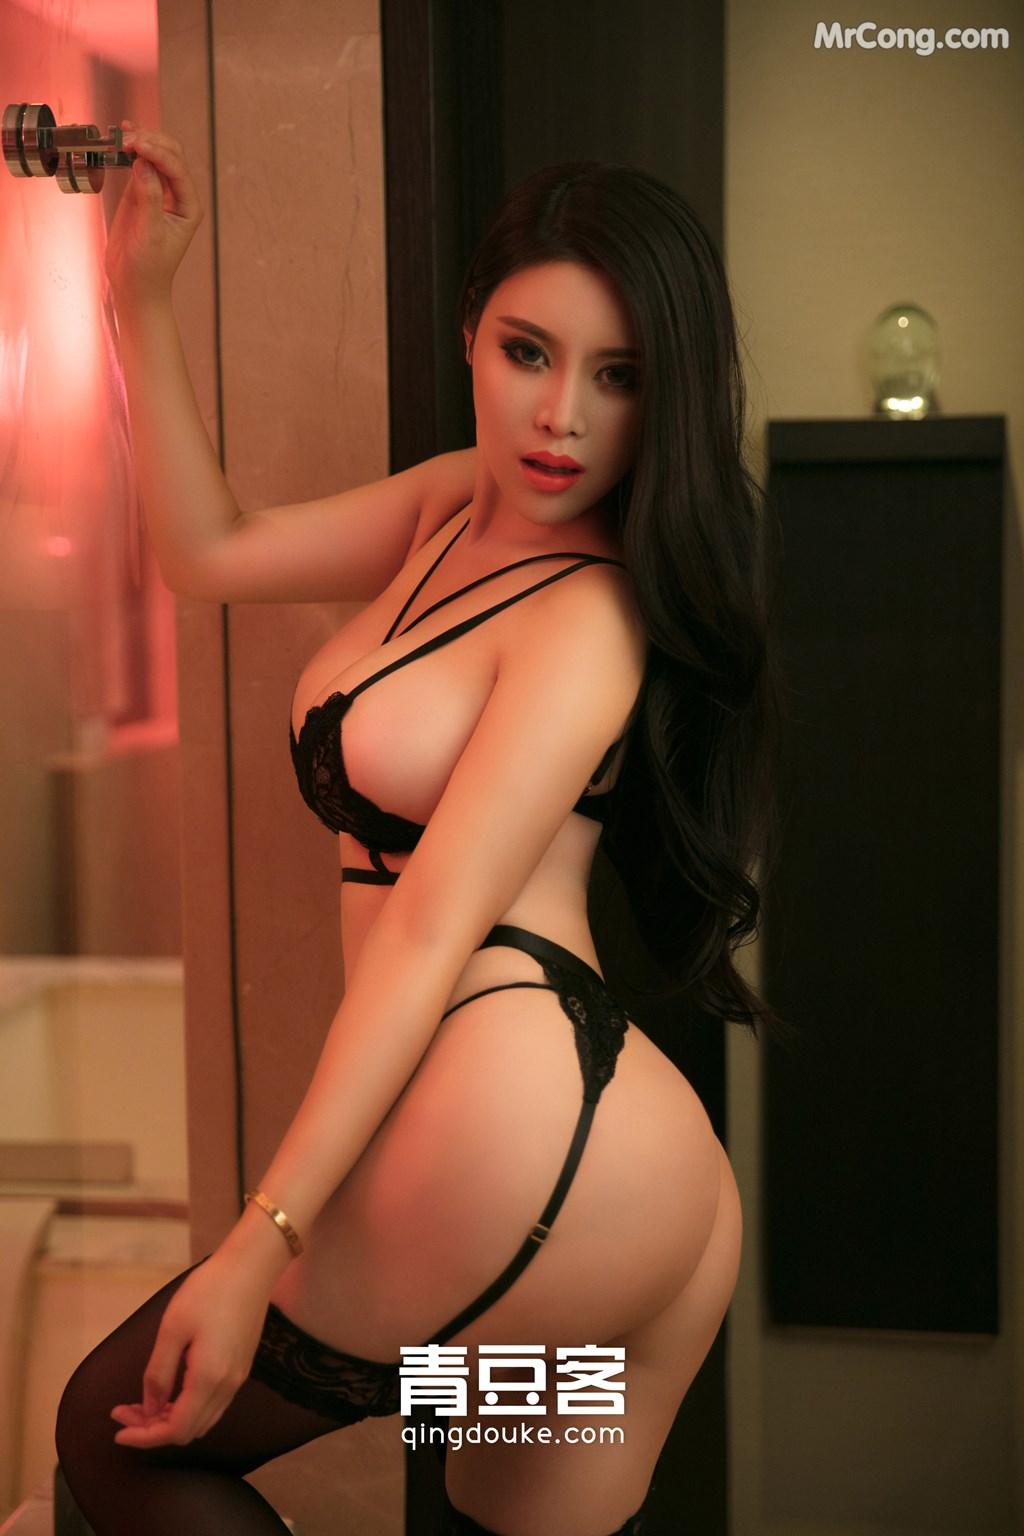 Image QingDouKe-2017-11-05-Ke-Rui-Na-MrCong.com-034 in post QingDouKe 2017-11-05: Người mẫu Ke Rui Na (可蕊娜) (48 ảnh)